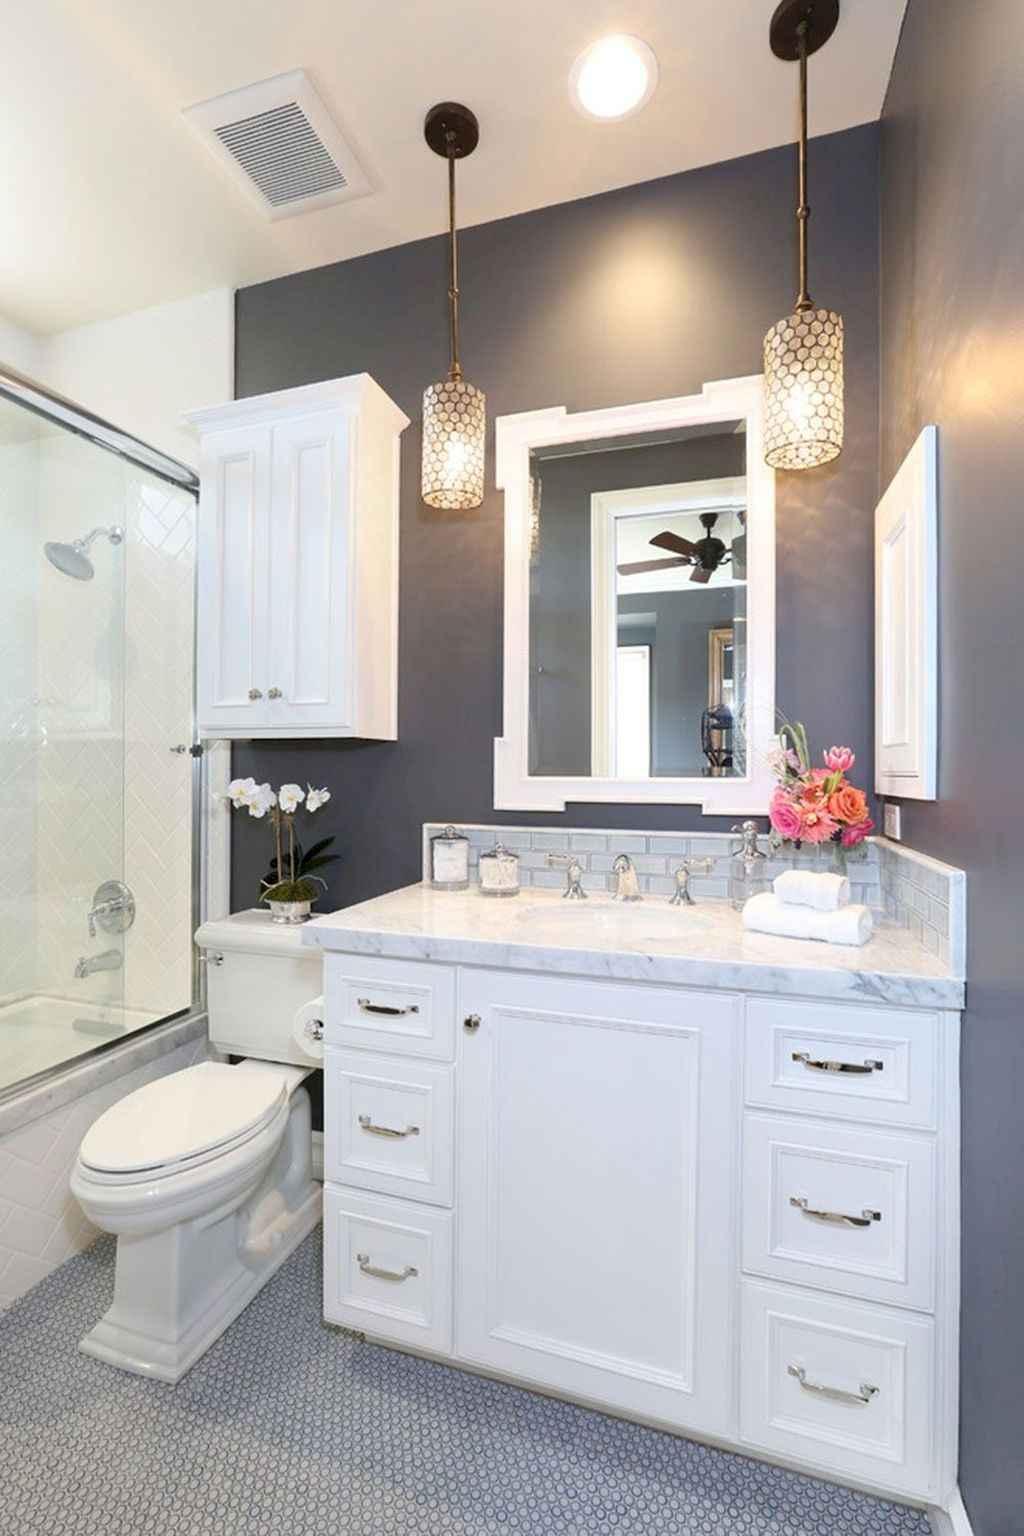 111 Brilliant Small Bathroom Remodel Ideas On A Budget (57)